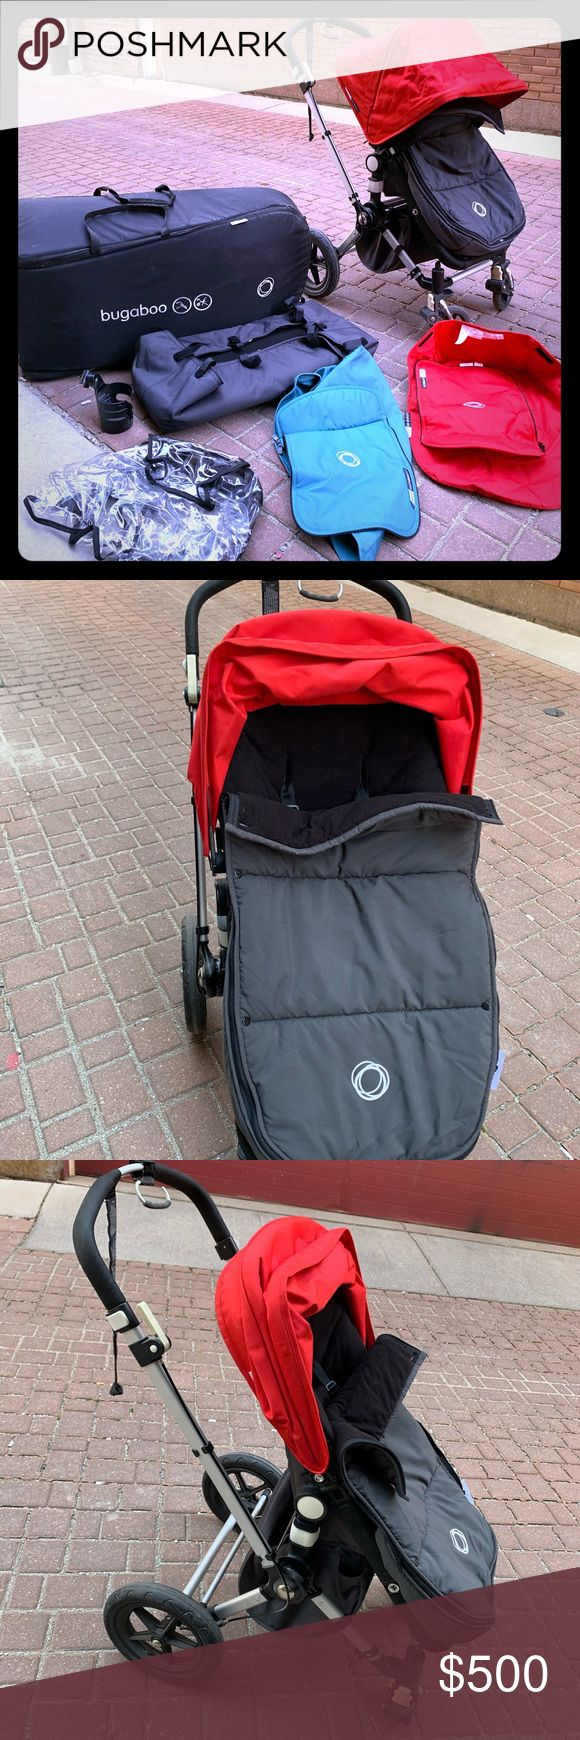 Bugaboo Cameleon Stroller + Accessories in 2020 | Bugaboo ...